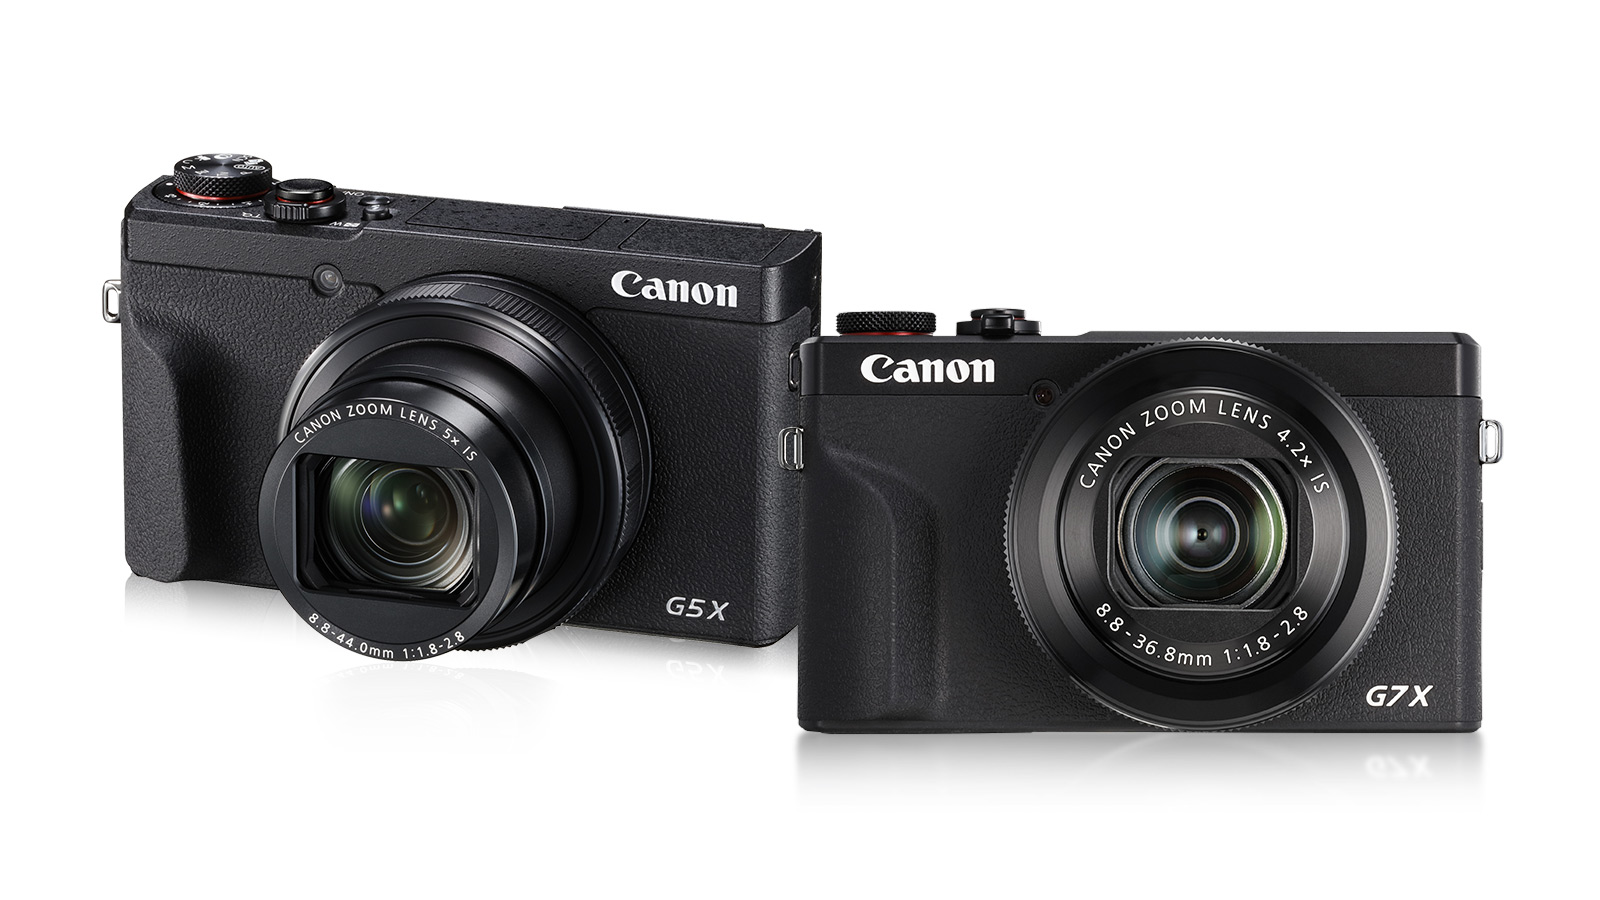 Canon Updates Compact Lineup with G5 X Mark II & G7 X Mark III